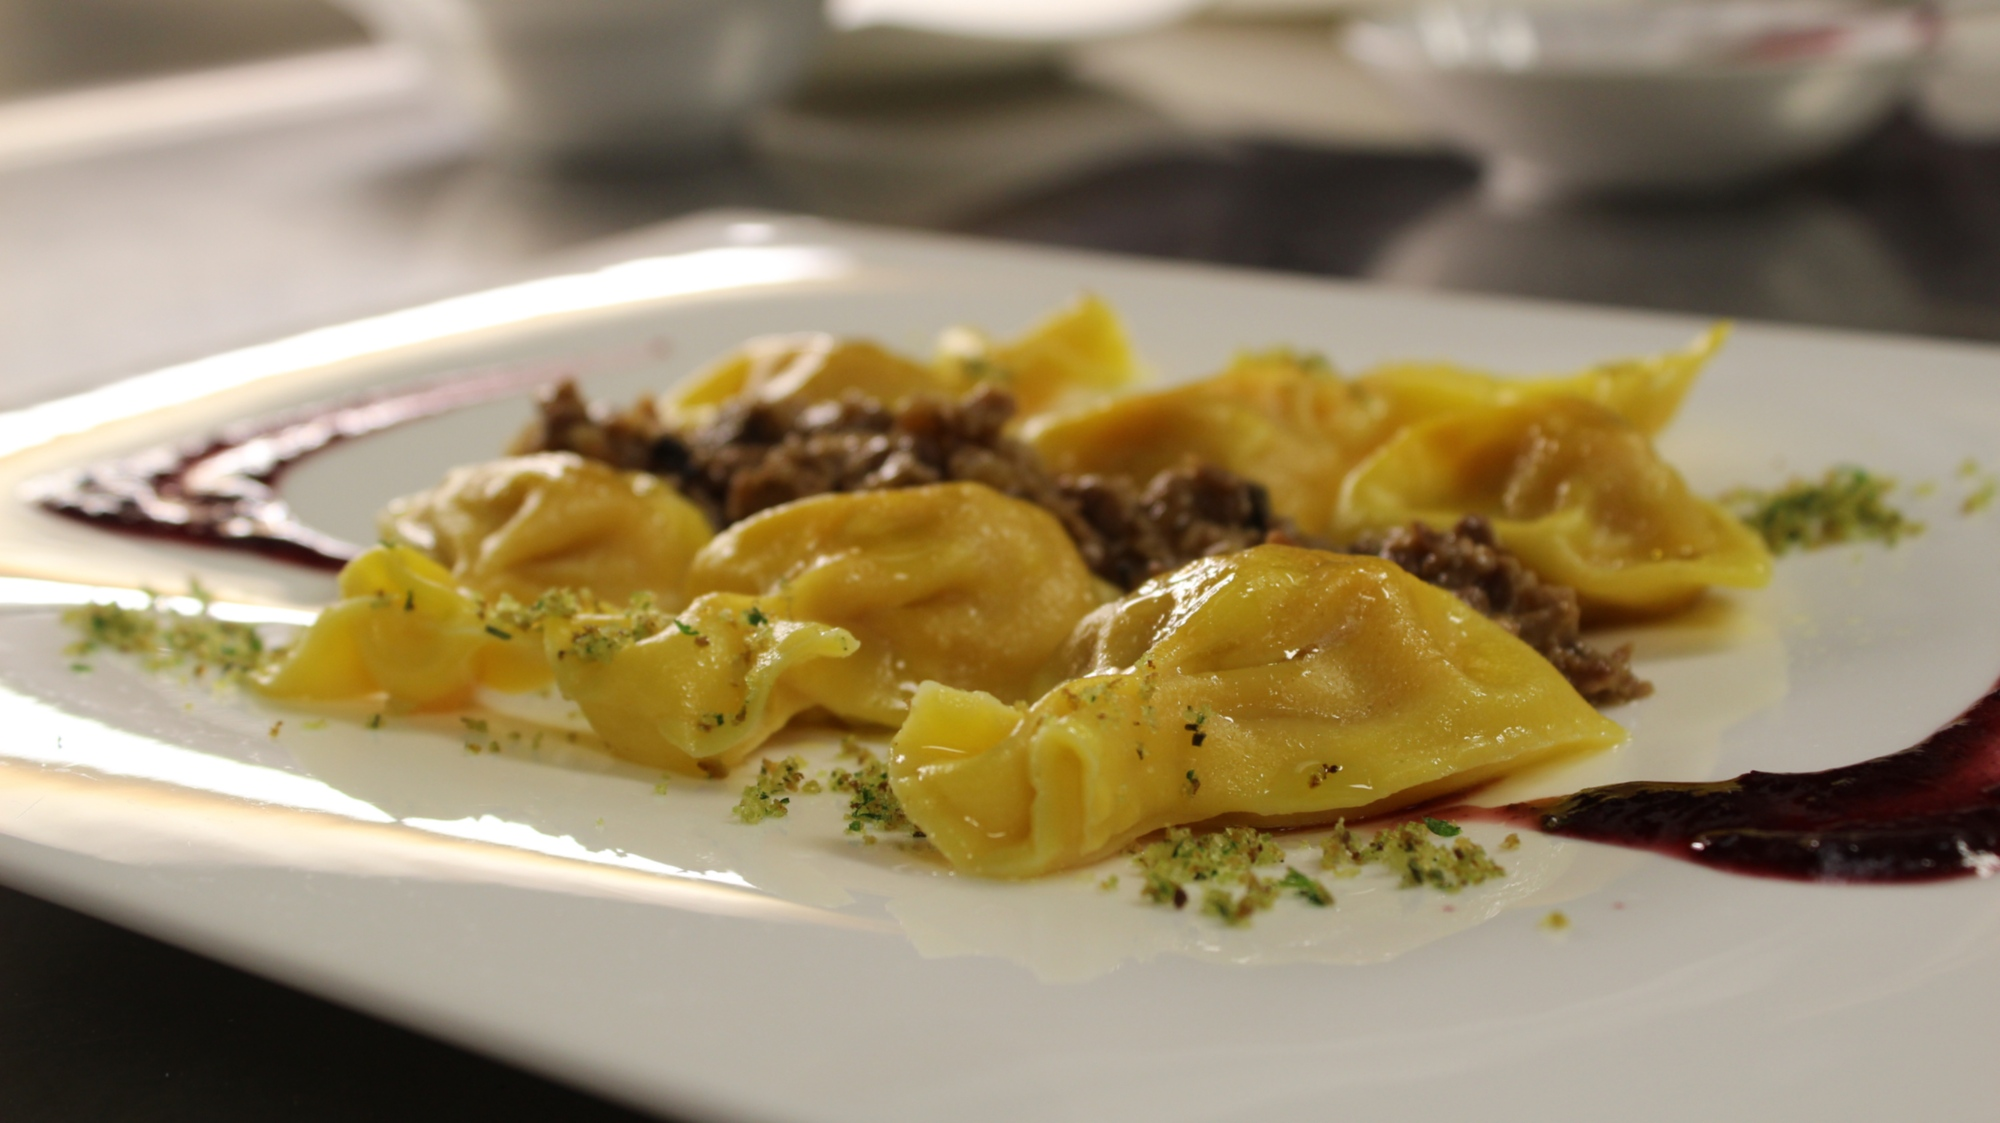 michelin starred restaurants in tuscany